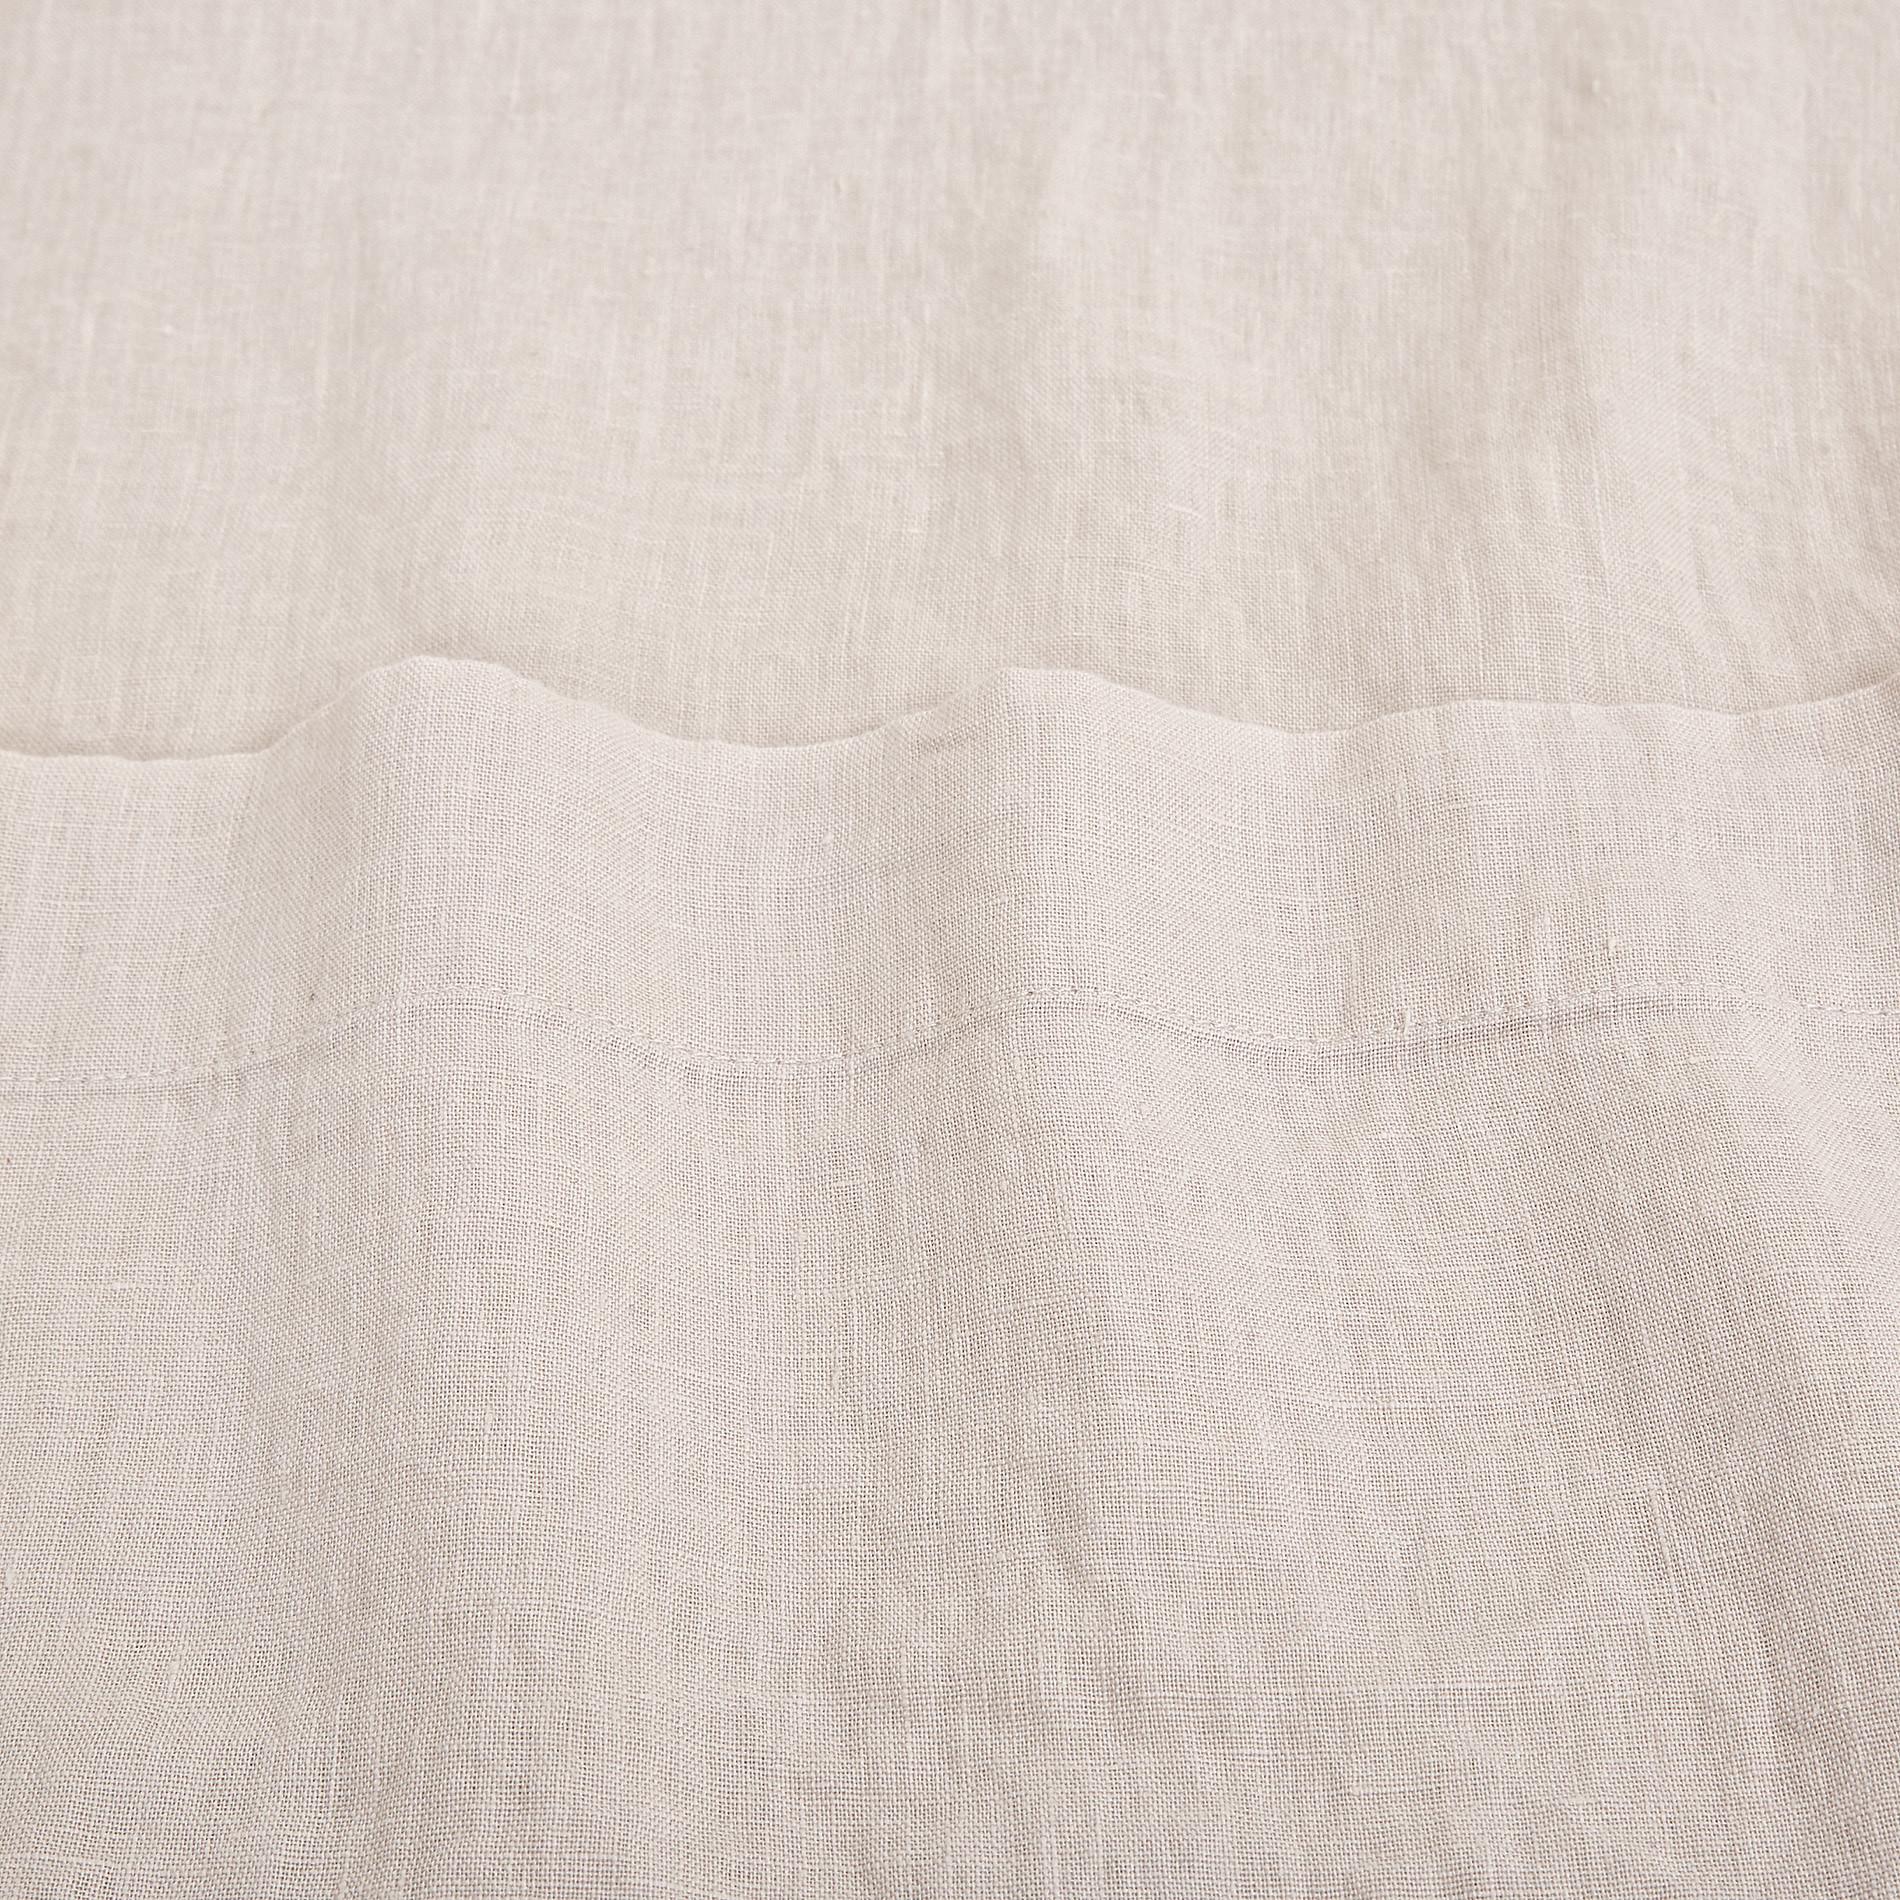 Lenzuolo liscio lino  Interno 11, Beige chiaro, large image number 3